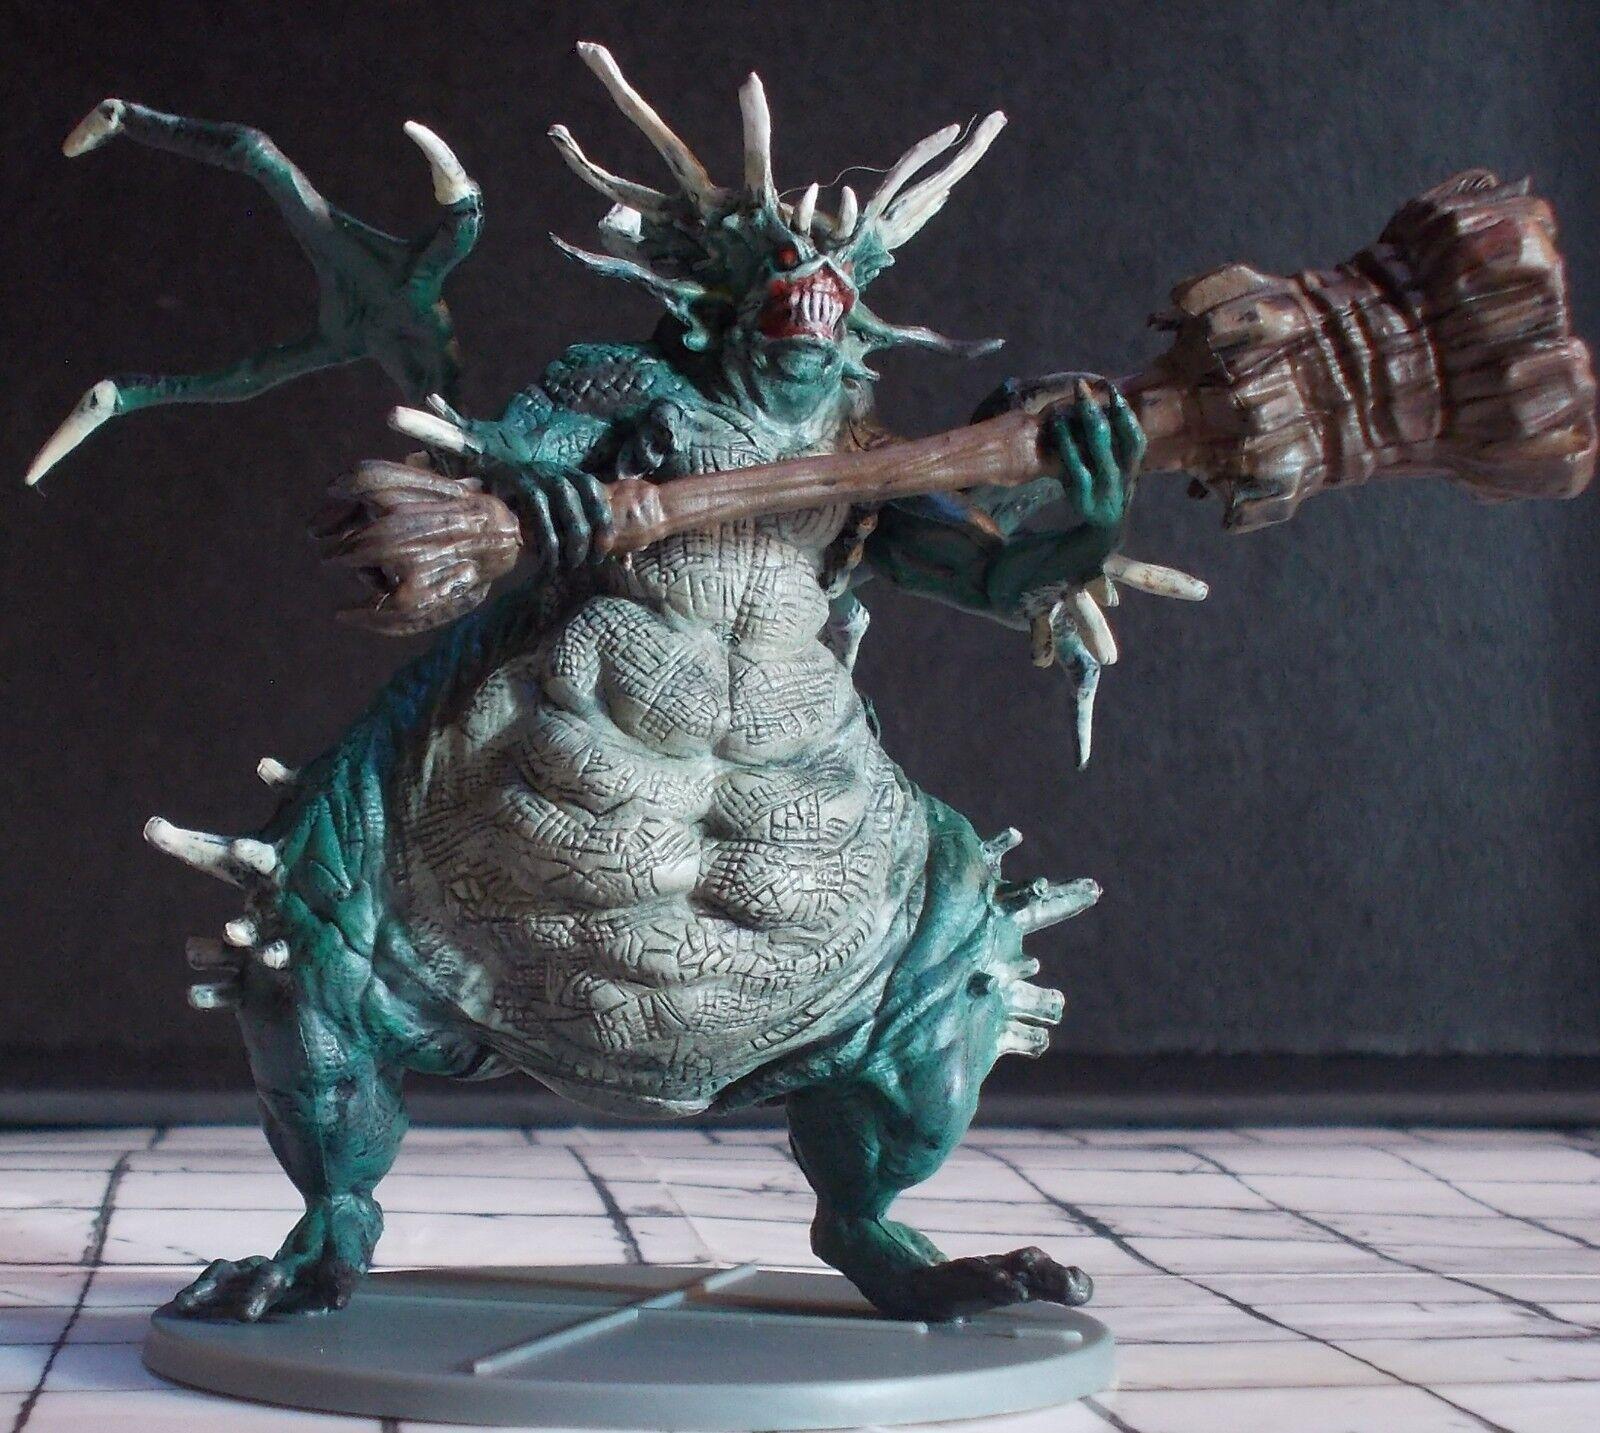 Painting Commission for Dark Souls Asylum Demon Expansion BUYER PROVIDES FIGURE